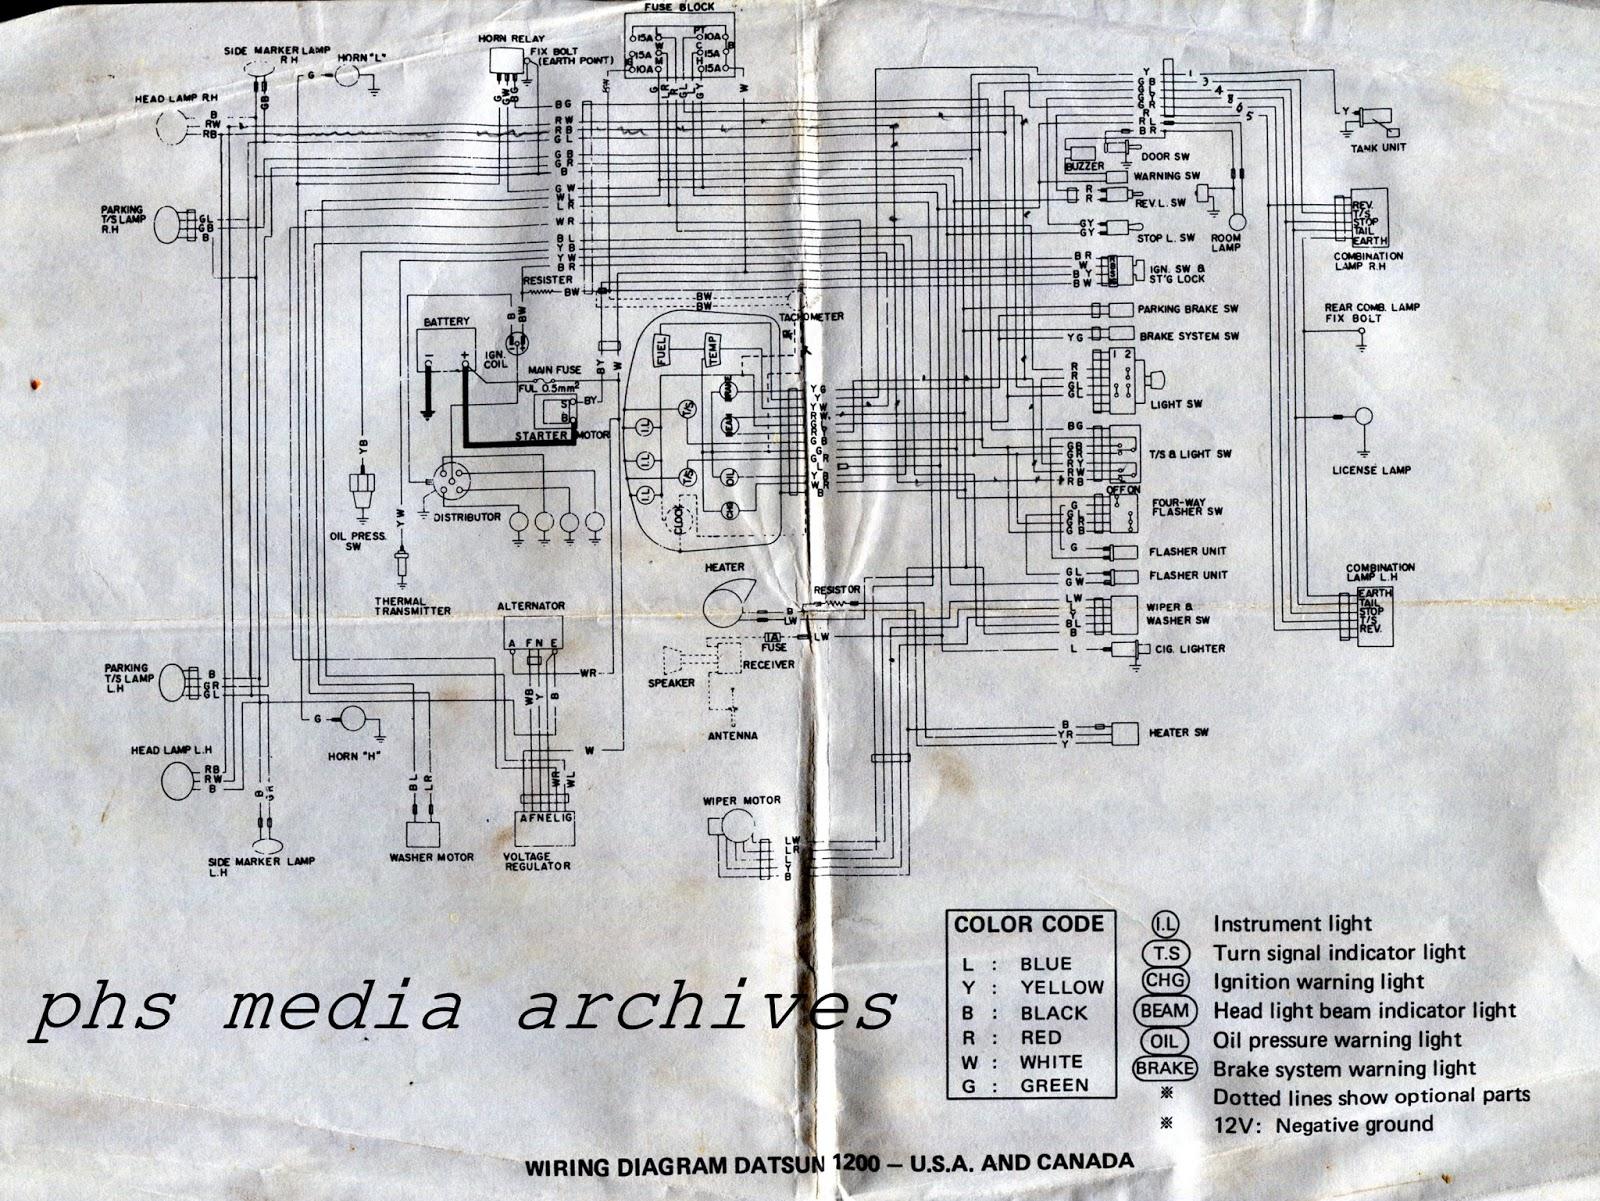 1971 datsun 510 wiring diagram water temperature gauge 1200 great installation of phs tech series 72 diagrams rh phscollectorcarworld blogspot com bakkie